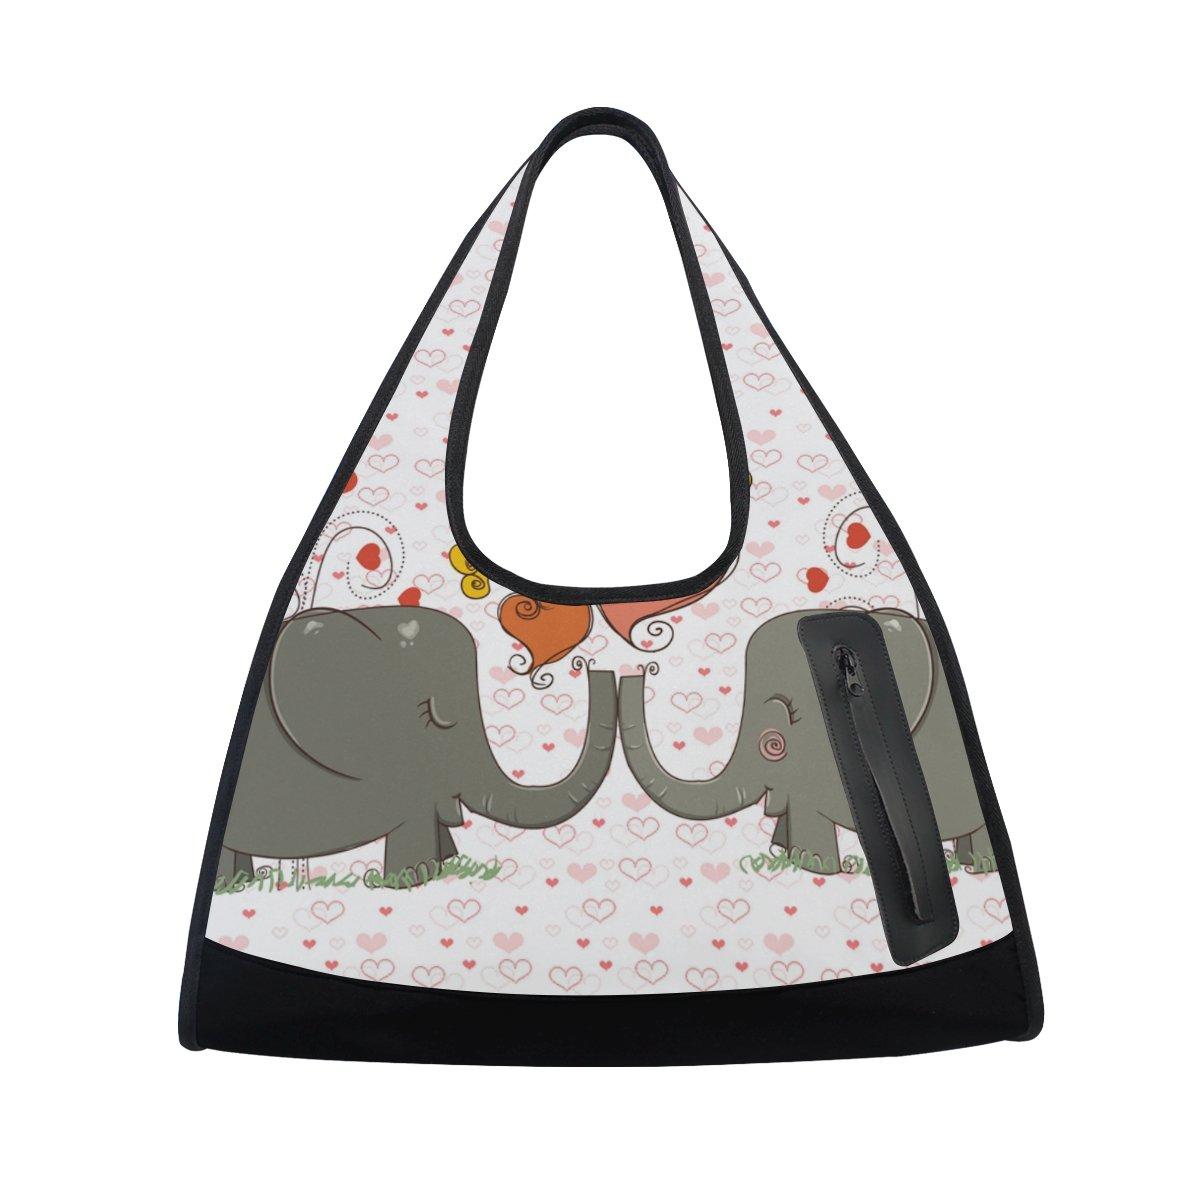 AHOMY Sports Gym Bag Elephant Love Heart Duffel Bag Travel Shoulder Bag by AHOMY (Image #2)